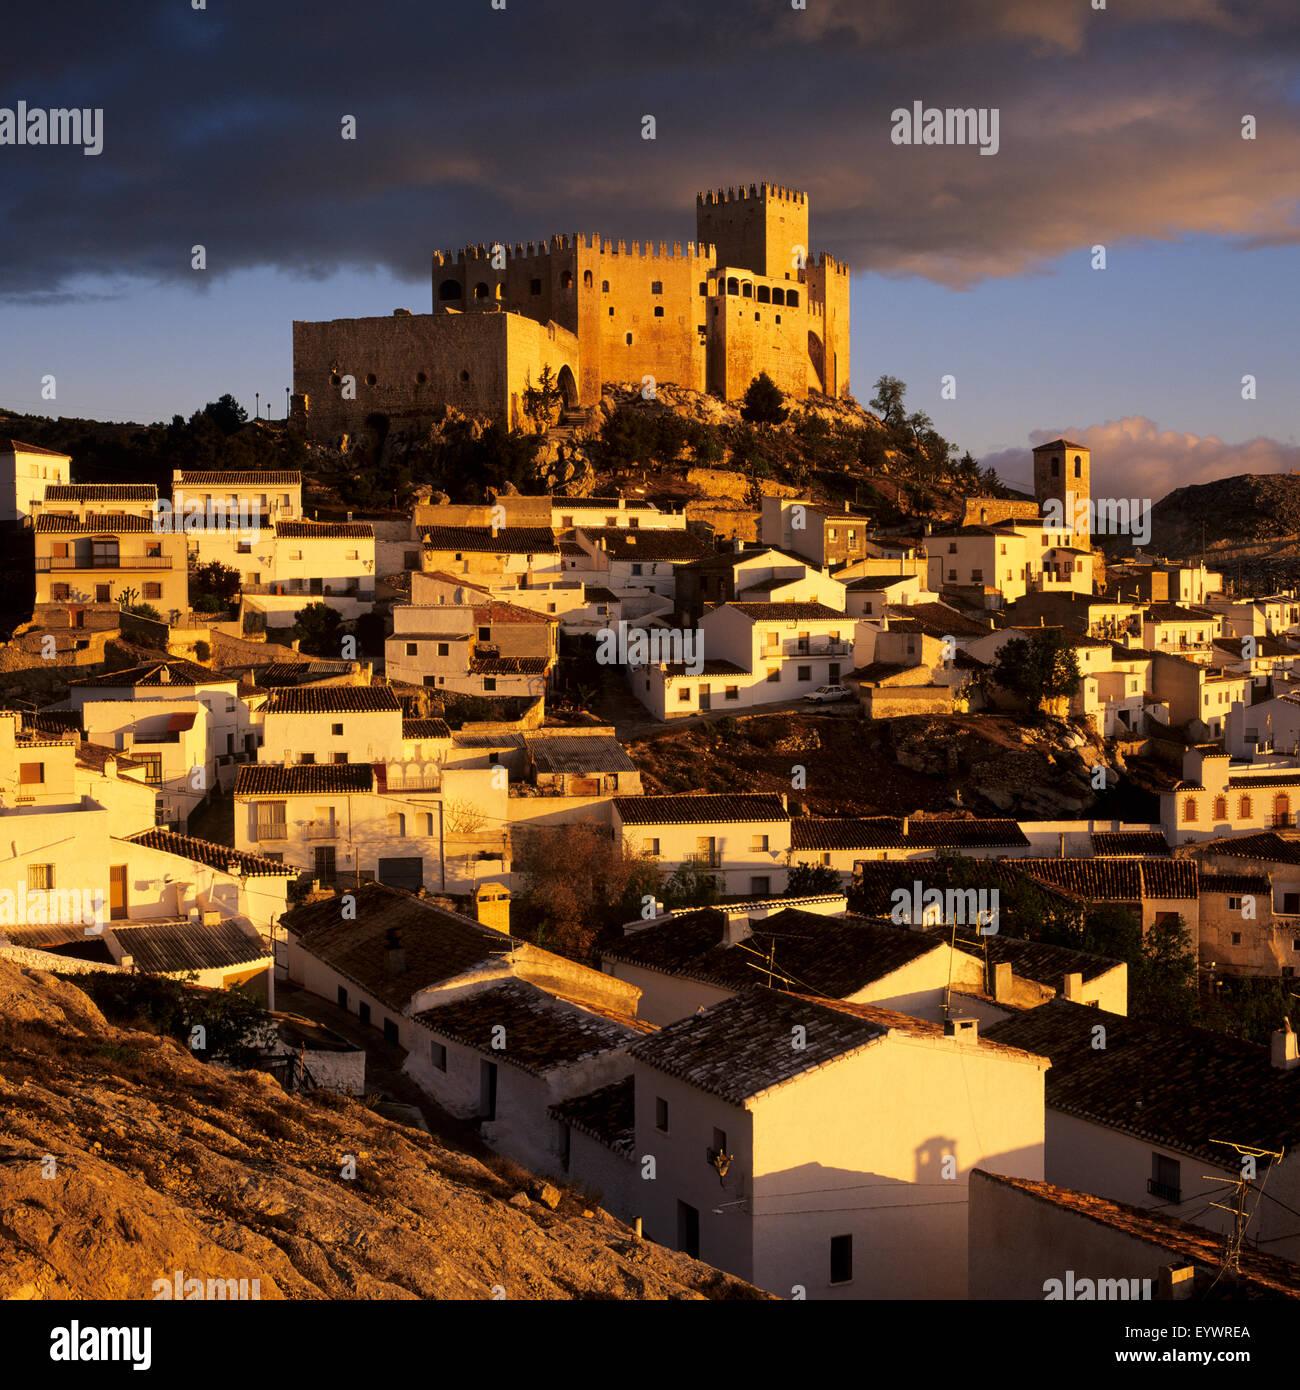 Renaissance castle and town, Velez Blanco, Almeria, Andalucia, Spain, Europe - Stock Image